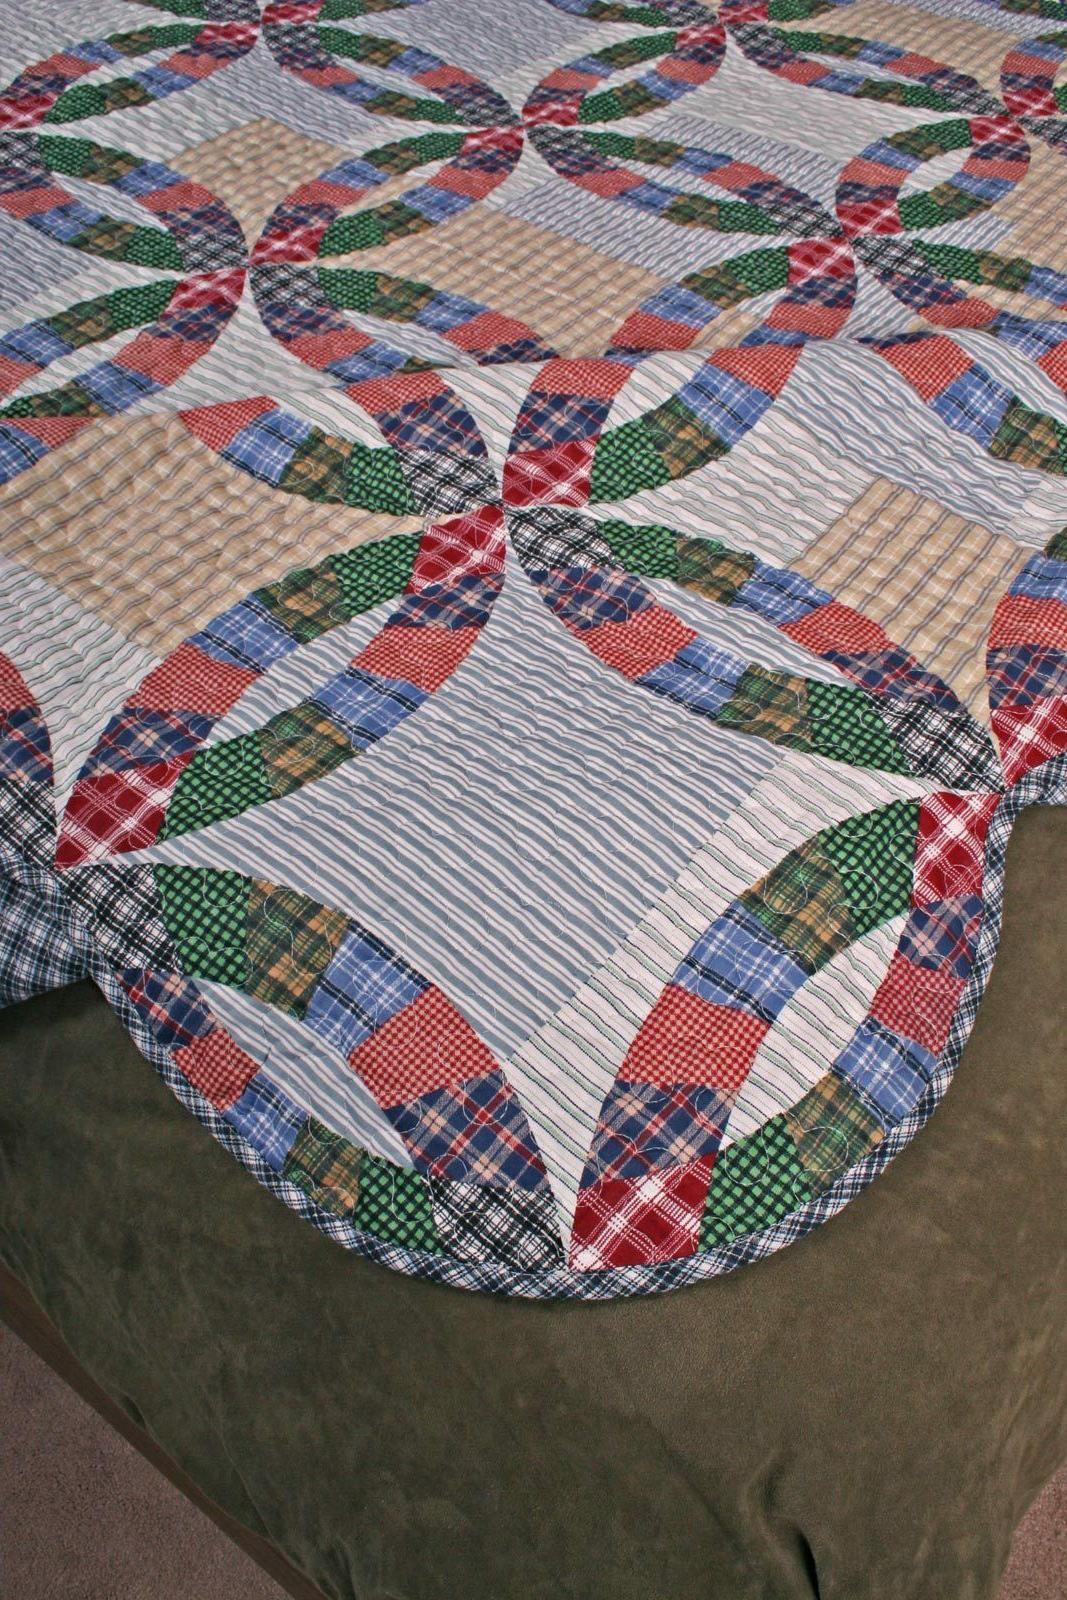 Quilt Americana Blanket Bedding